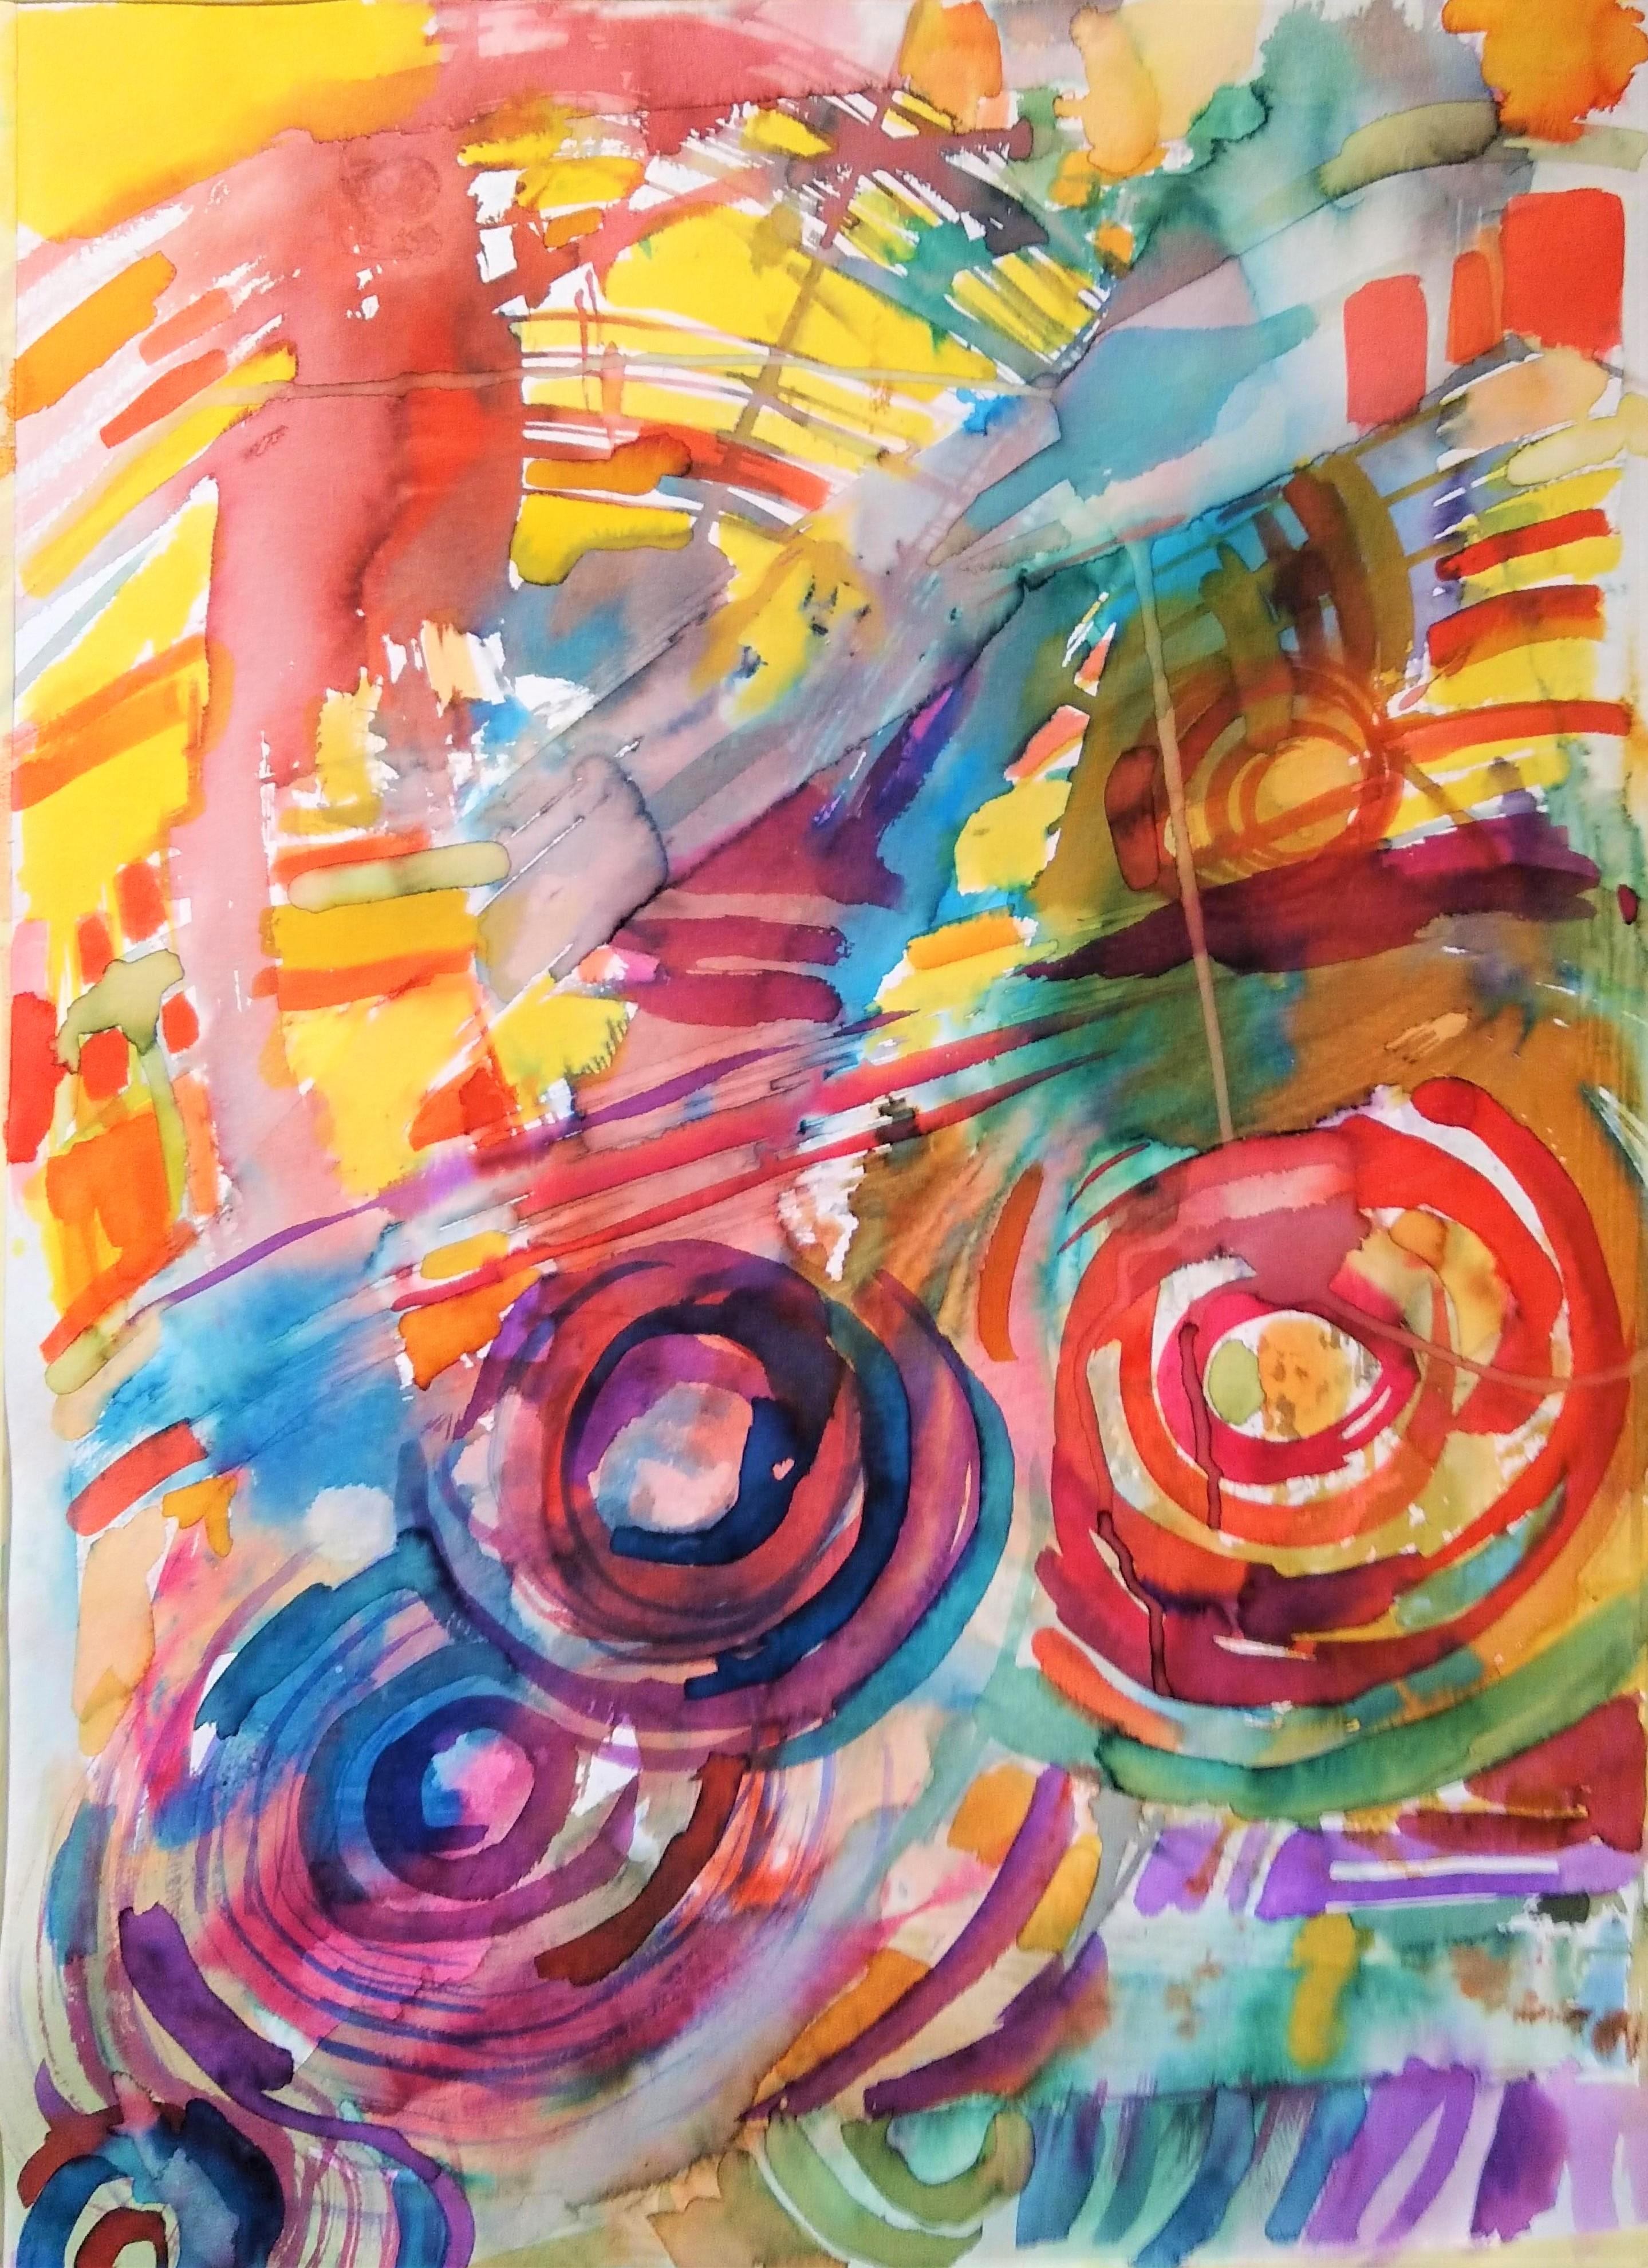 ABSTRAKCJA WIOSENNA 50 x 65 cm, barwne tusze i akwarela